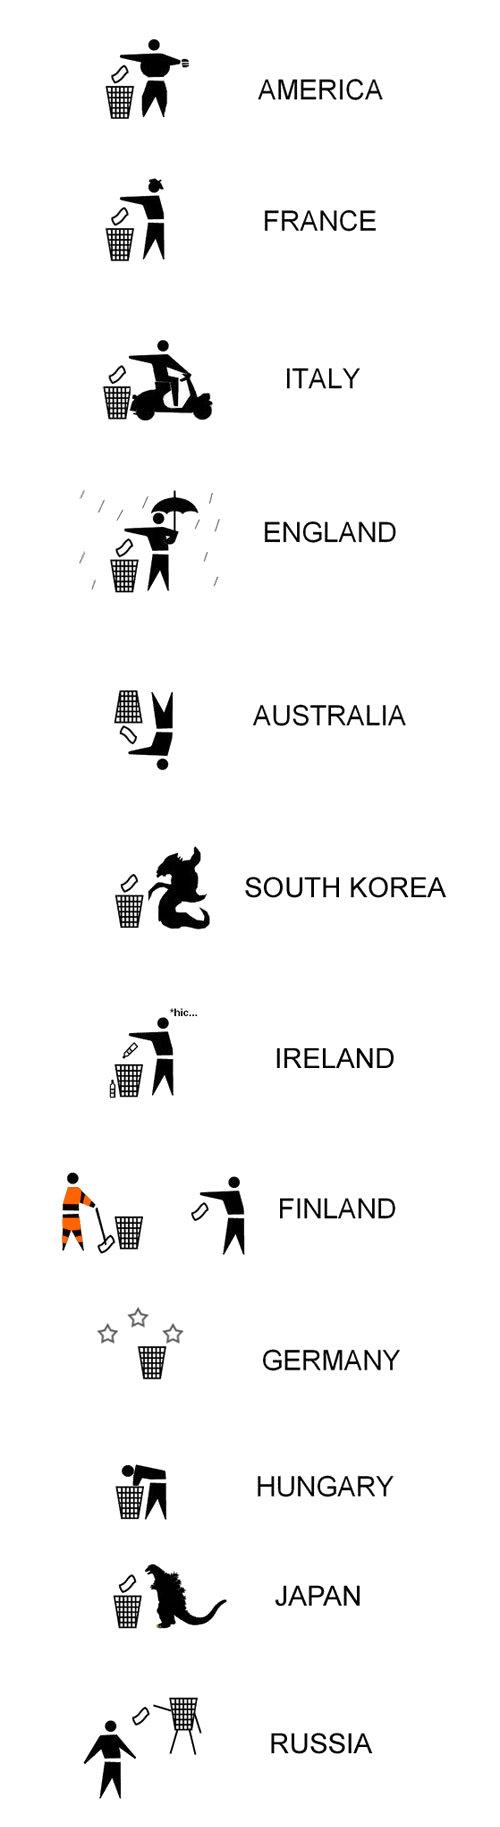 trash. . AMERICA arll d) FRANCE ITALY g' I ENGLAND Atl, 1 E ll AUSTRALIA d? SOUTH KOREA trt; Jr'' IRELAND aw A d' FINLAND MR A Ylt ltr tlt E GERMANY miimii HUNG